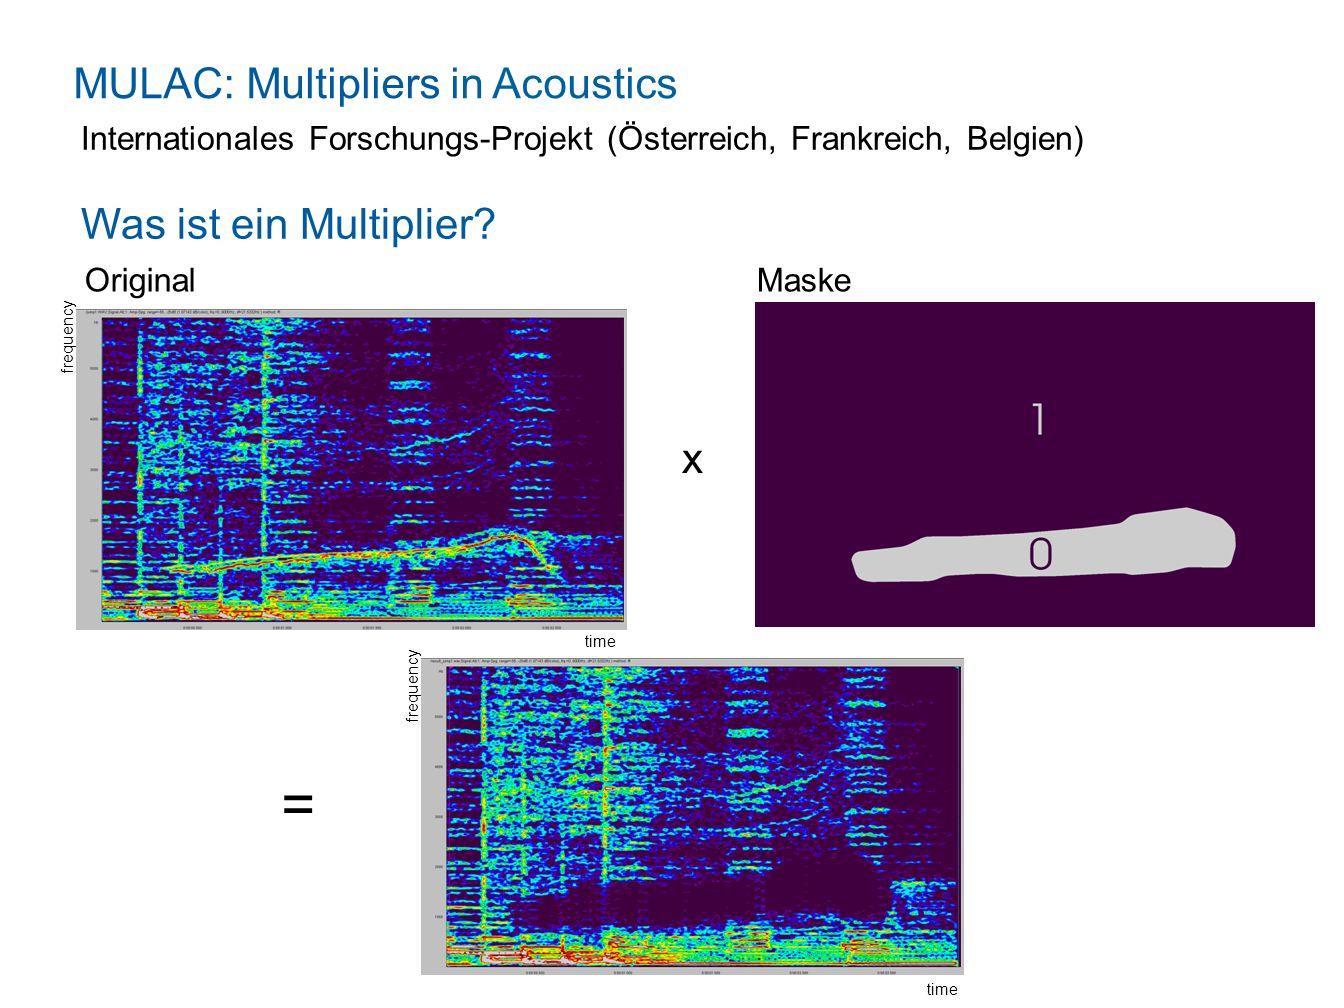 = MULAC: Multipliers in Acoustics Was ist ein Multiplier x